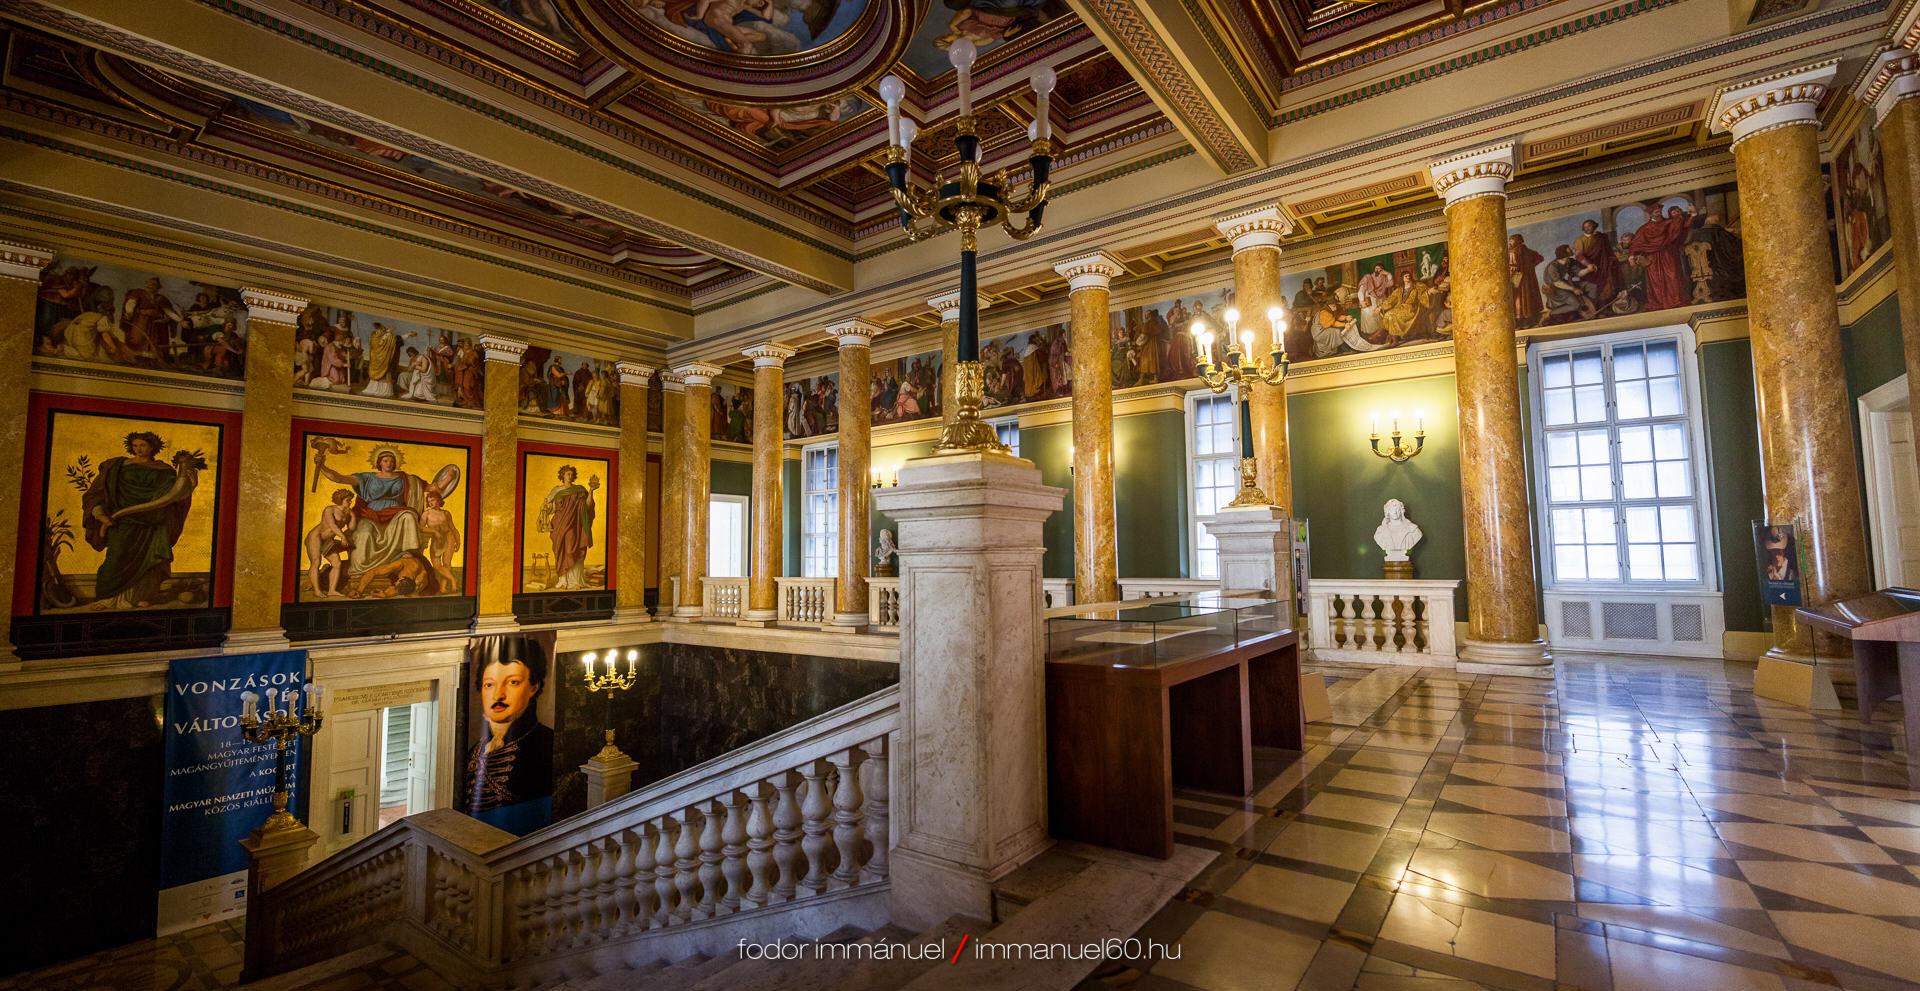 magyar nemzeti múzeum budapest nemzeti múzeum muzeológus lopás